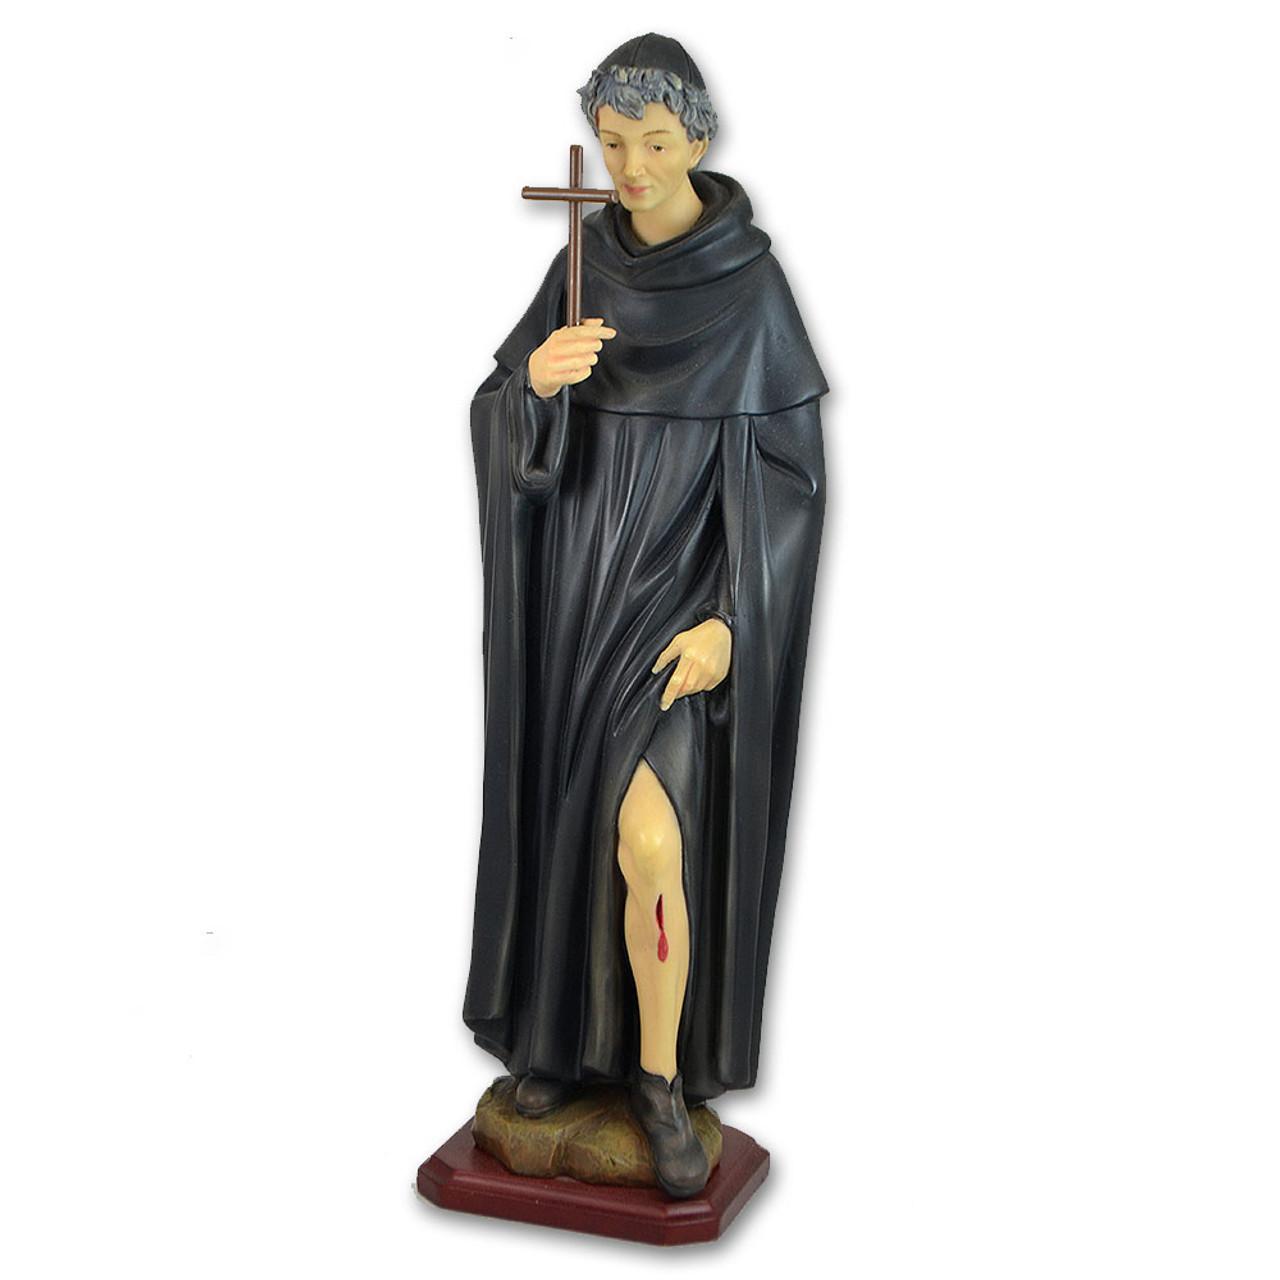 St Peregrine Classico Statue 12IN